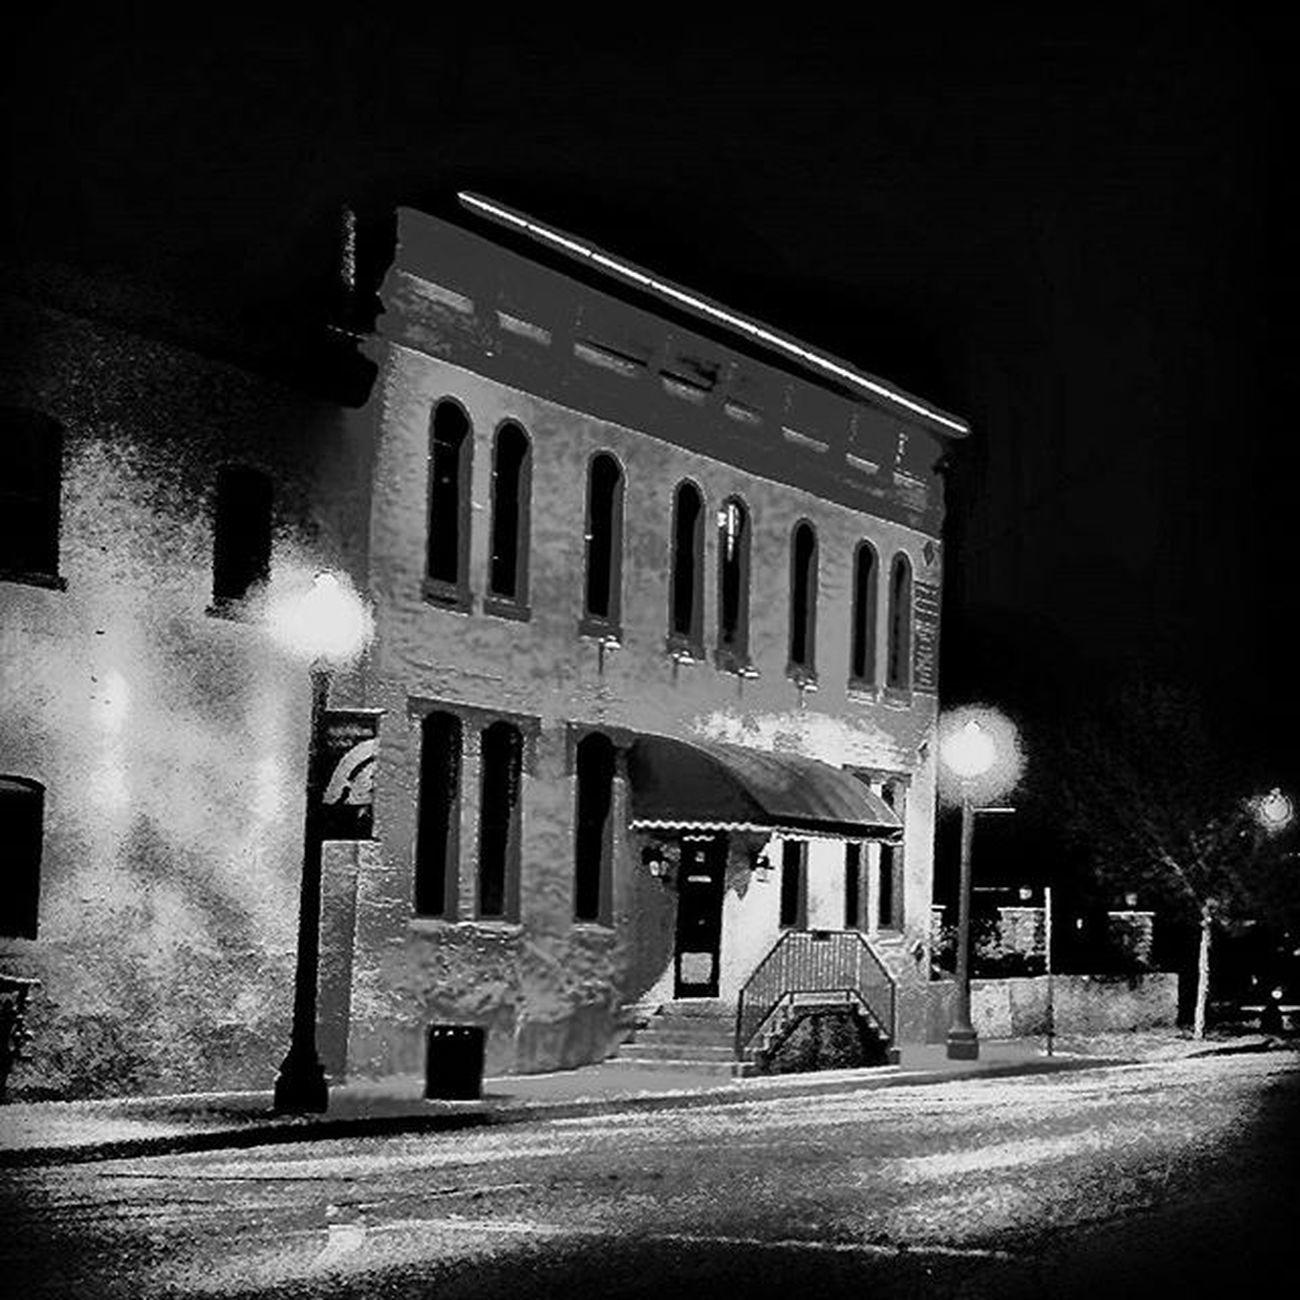 River House again at night....... Ks_pride Atchison Wow_america_bnw World_bnw Trb_bnw Nightphotos Nightphotography Nighttimebnw Bnw_night